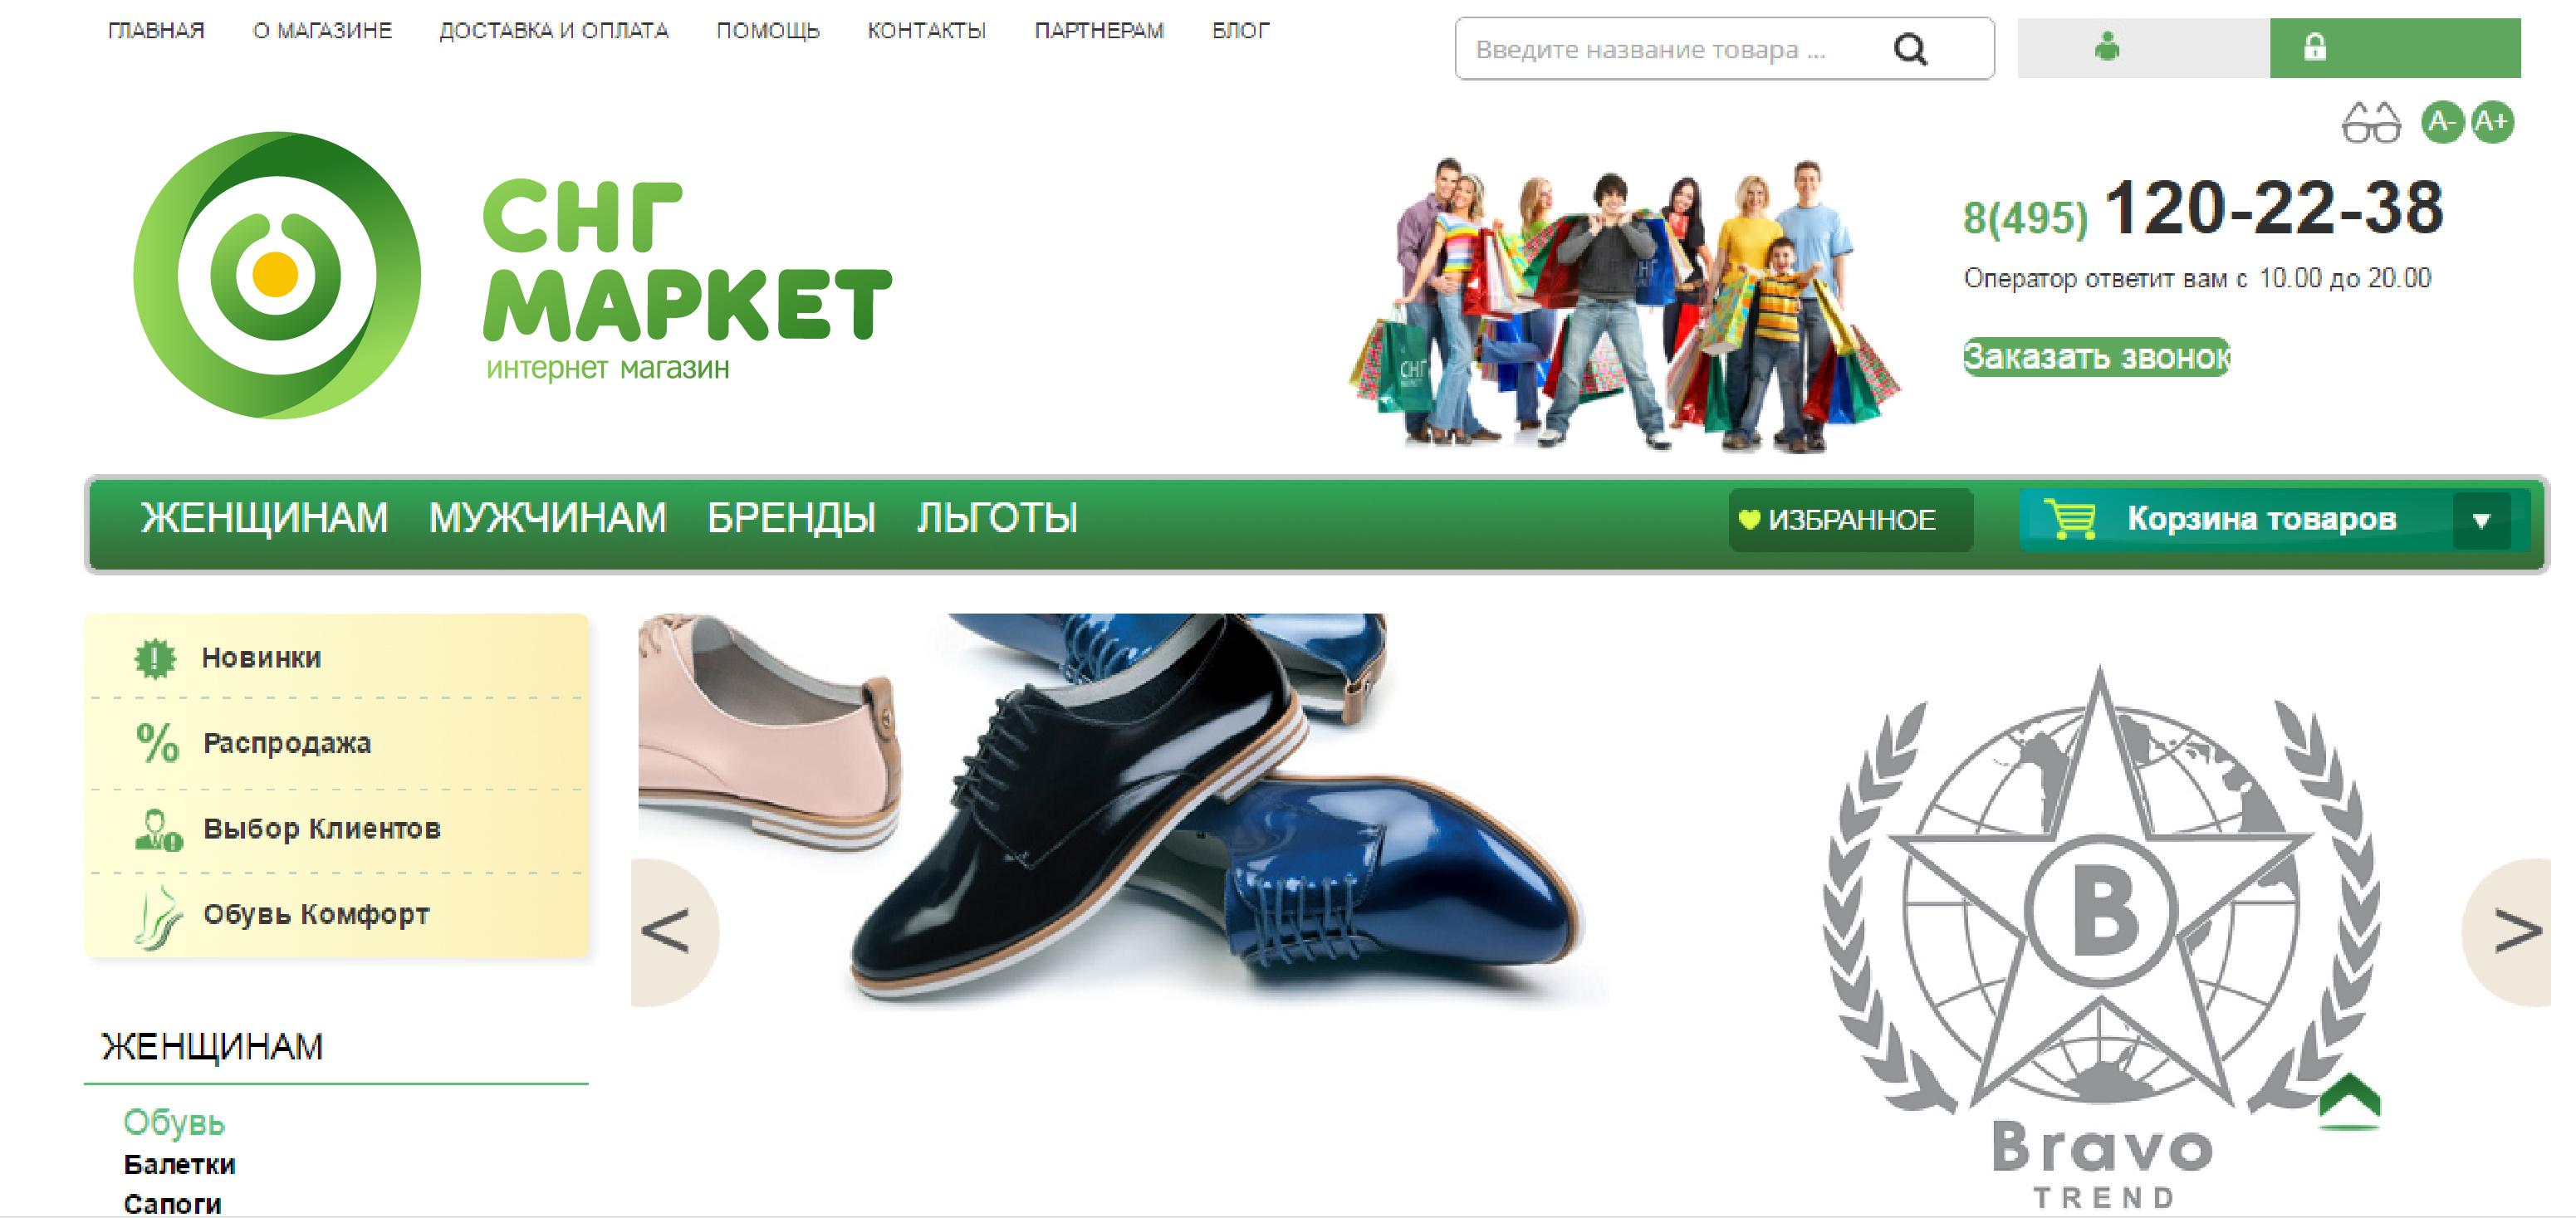 Объявляется конкурс на создание логотипа ИМ обуви фото f_3645a14c4050d27f.jpg